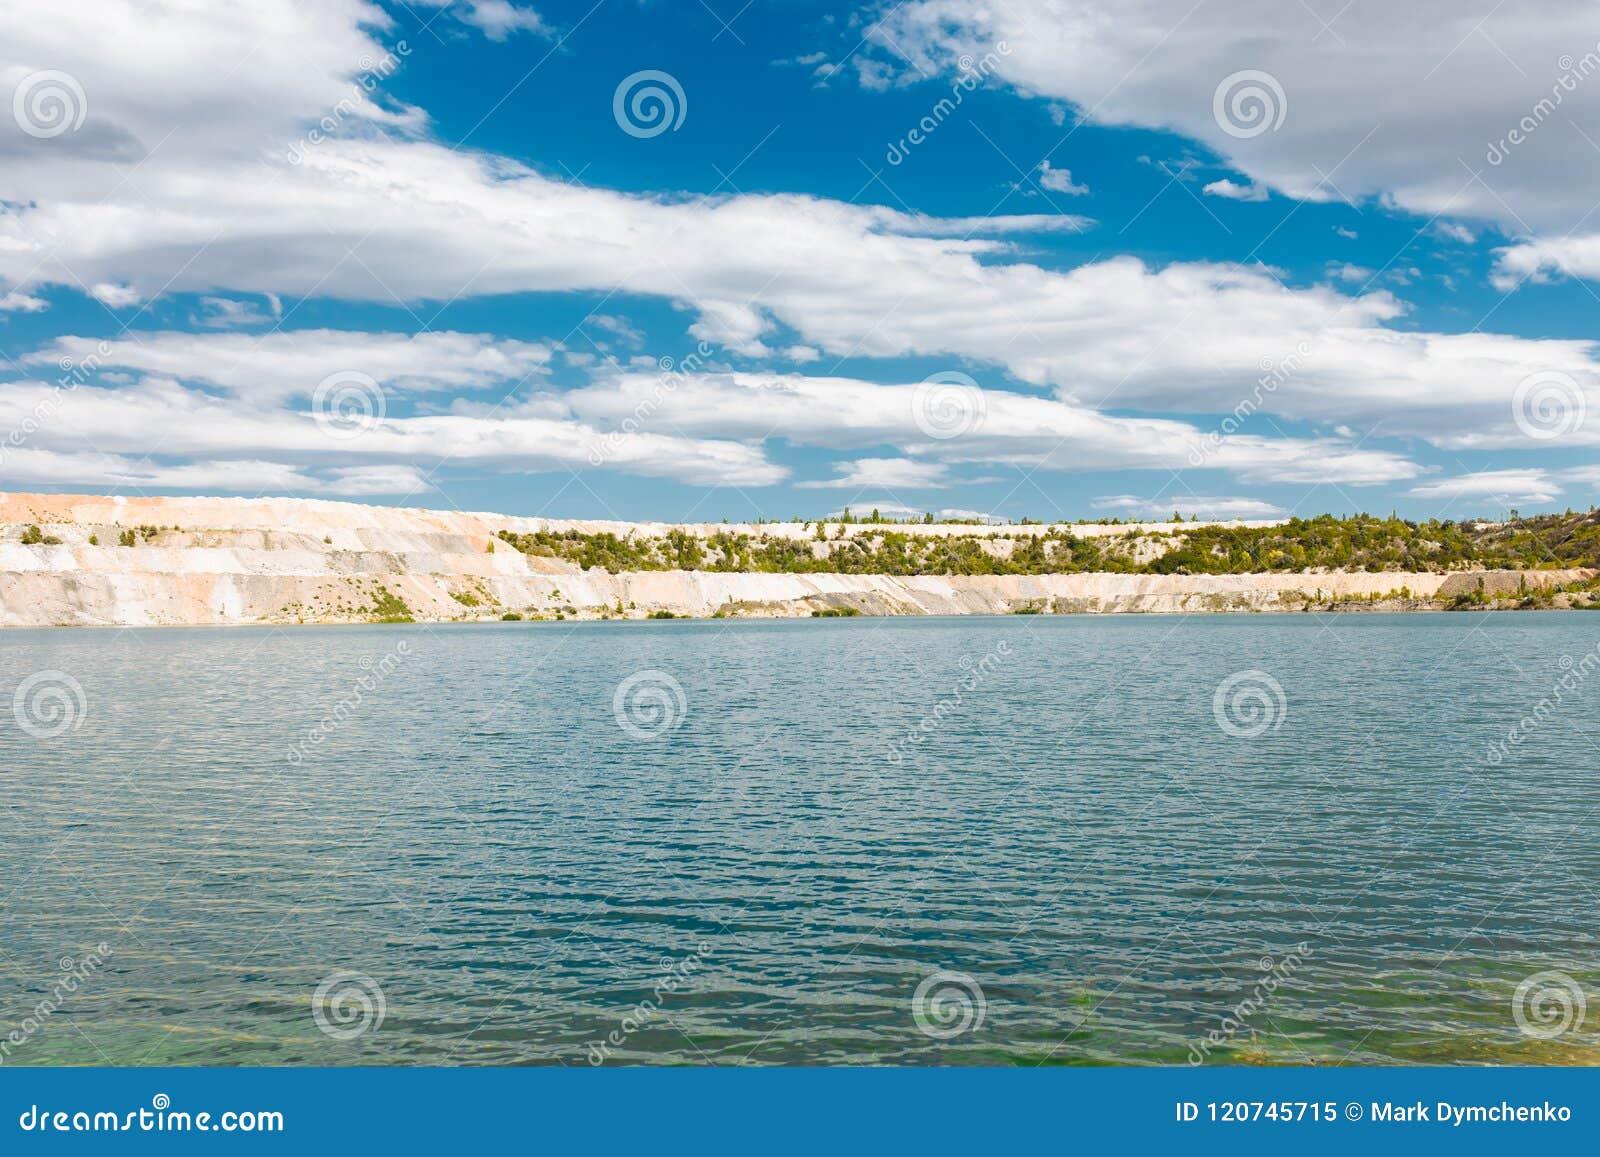 Landscape Of A Beautiful Lake, The Bay, Small Island, Resort